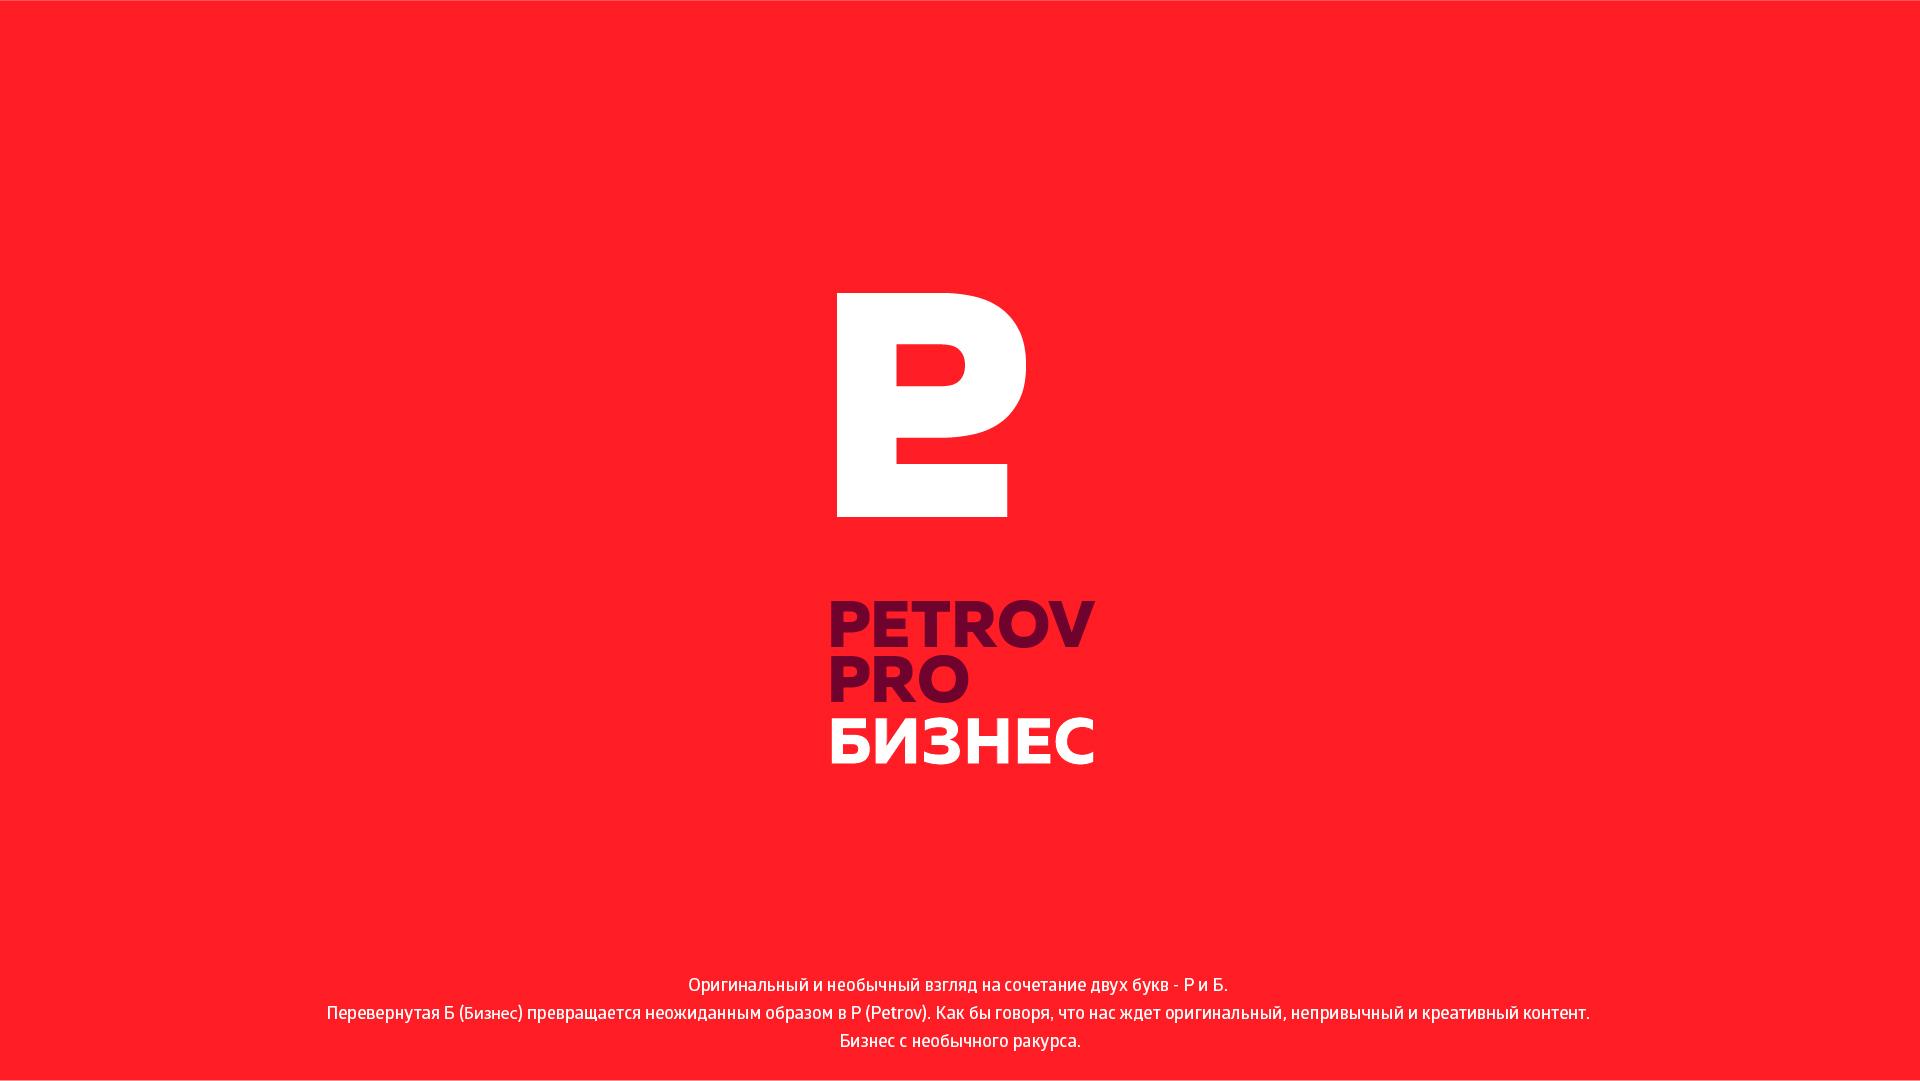 Создать логотип для YouTube канала  фото f_7275c0ab8a346c61.jpg